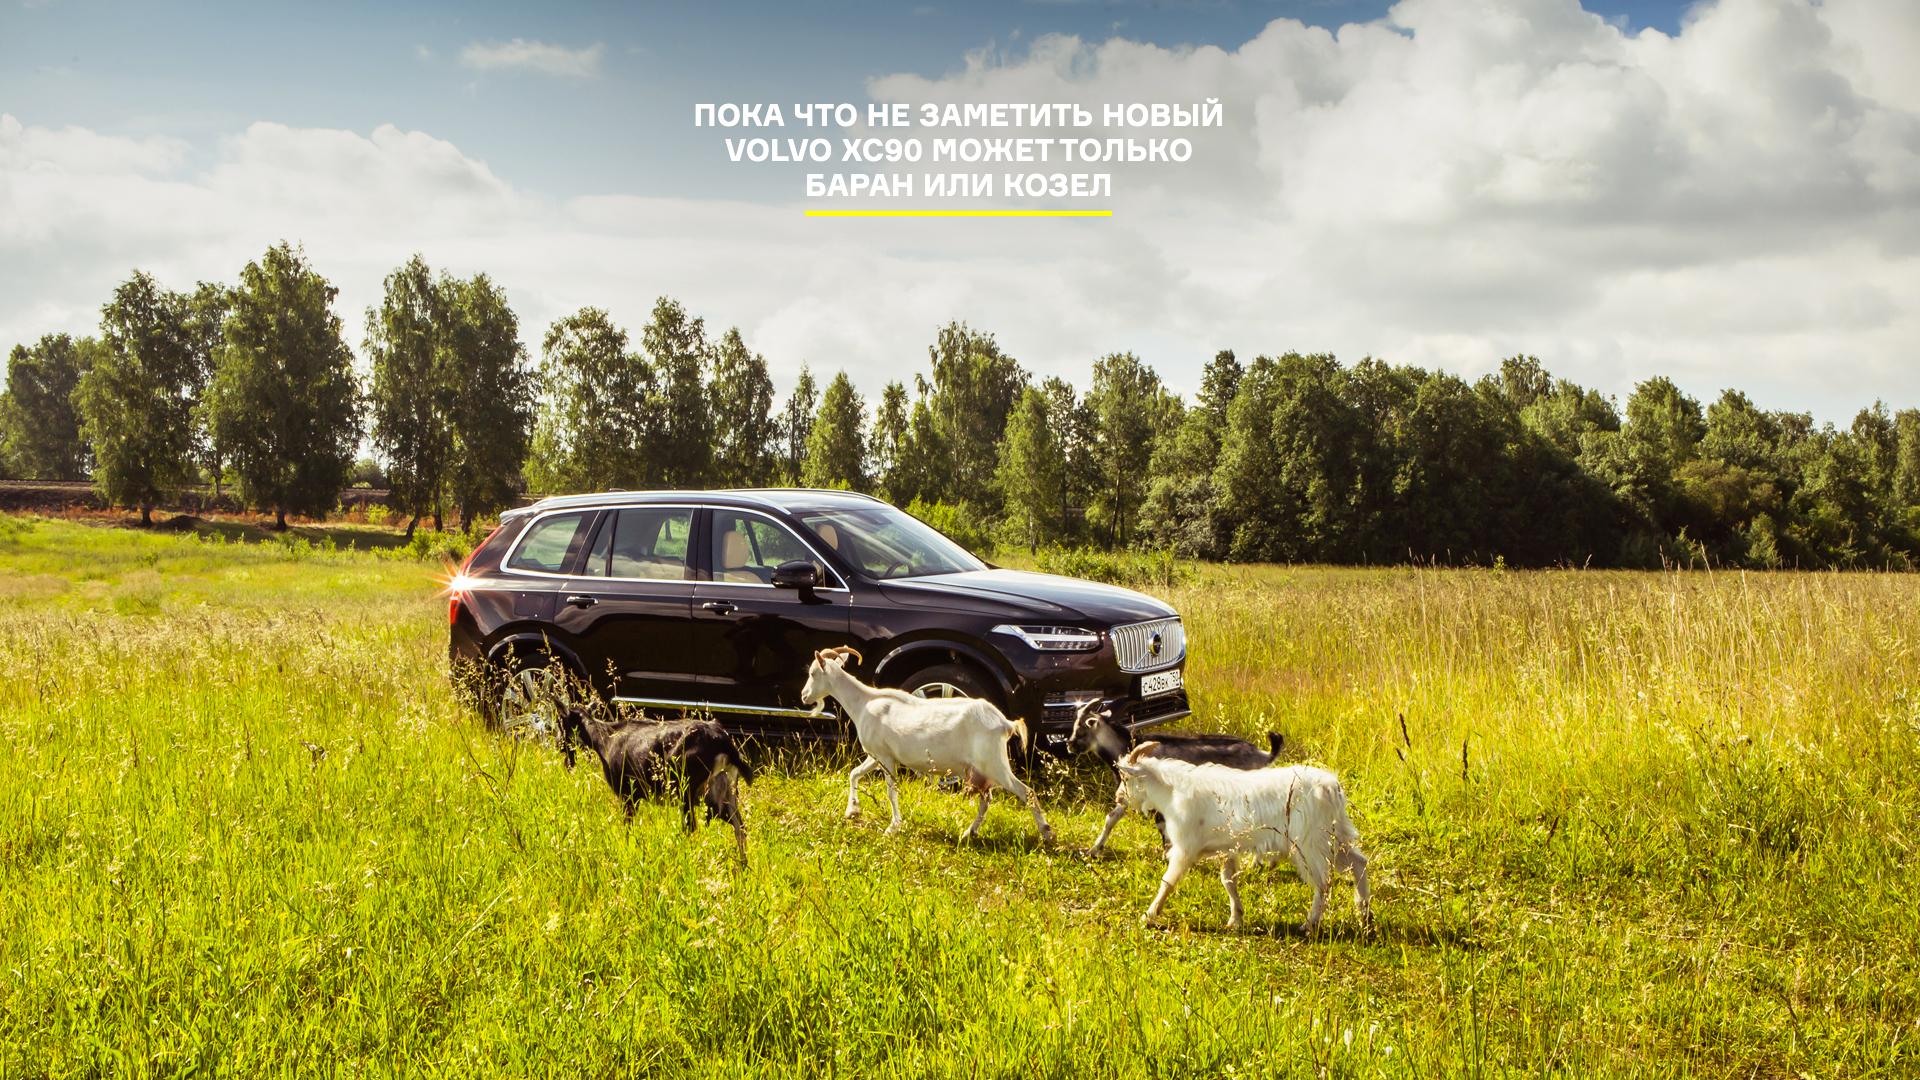 21-дюймовые колеса вроссийских ямах иматрешка вместо рычага «автомата»: тест Volvo XC90. Фото 4